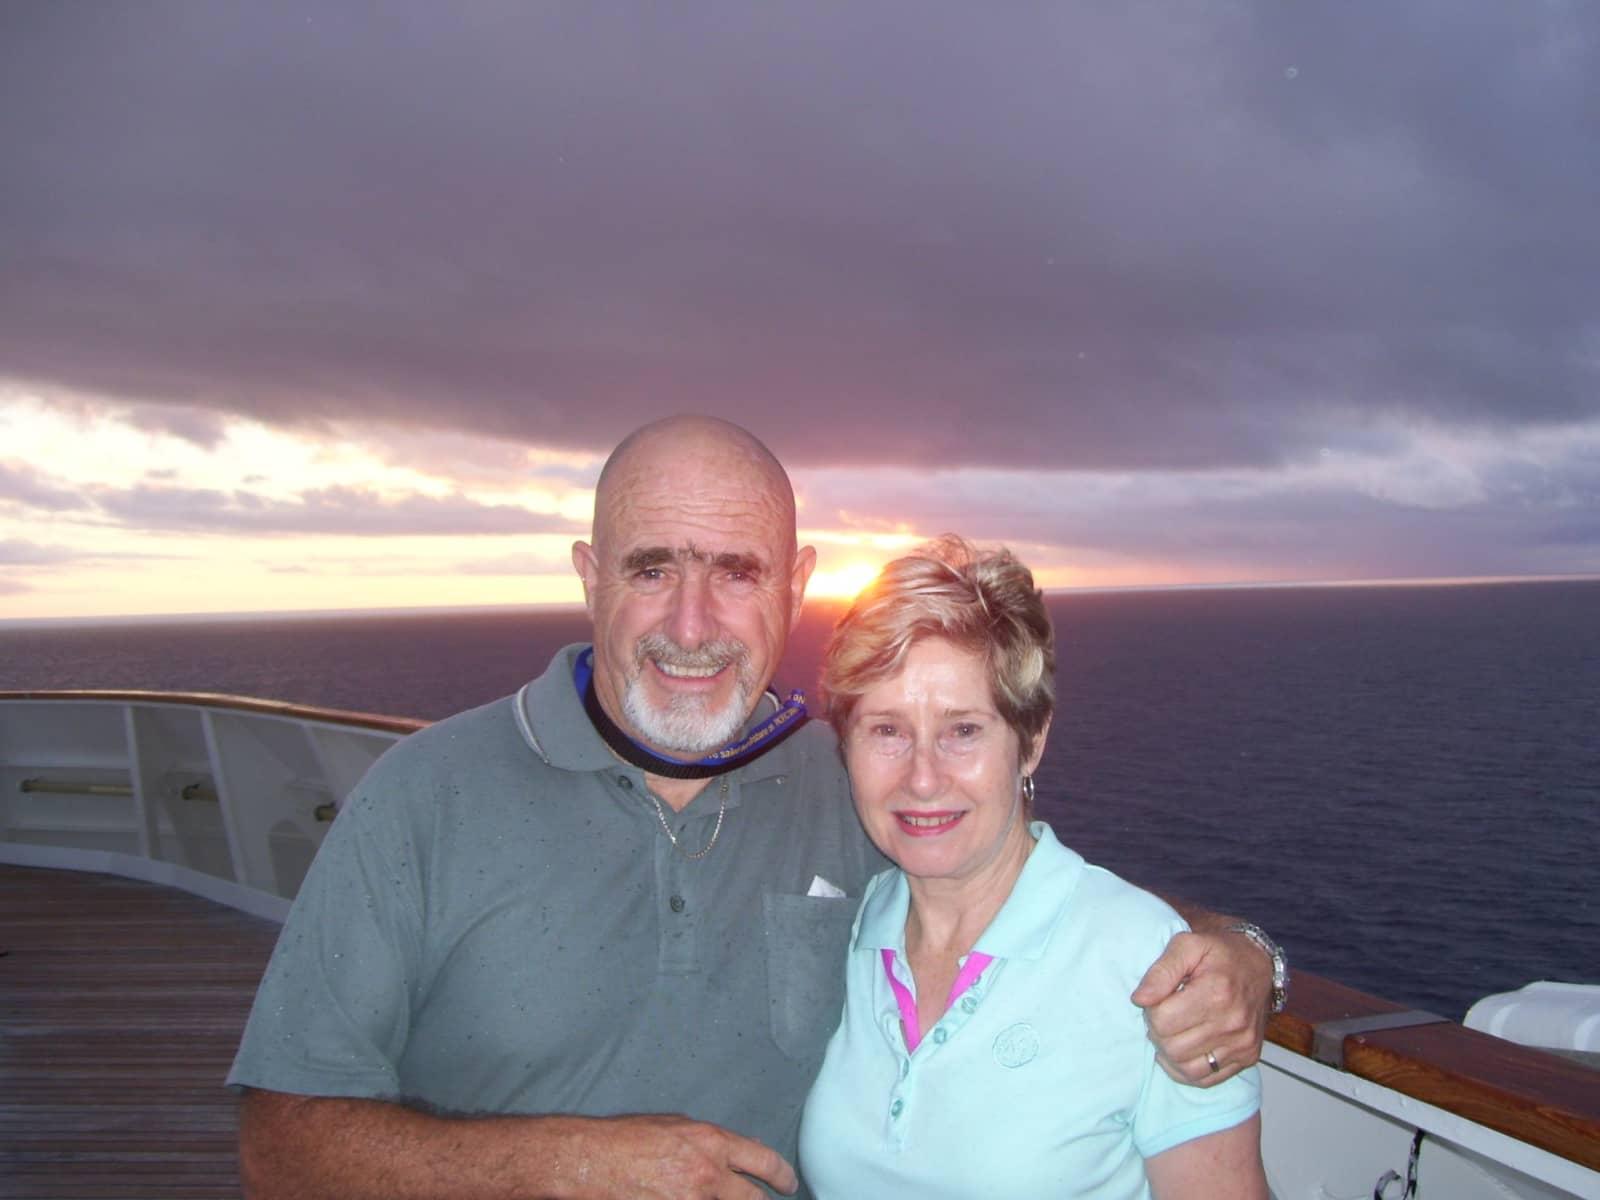 Eric & Shaneen from Stanthorpe, Queensland, Australia